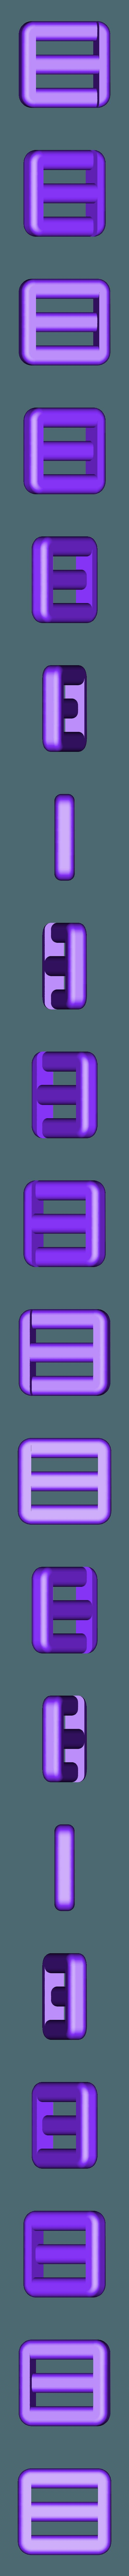 self-locking_buckle.stl Download free STL file Self-locking buckle and loop • 3D printing object, WaterLemon